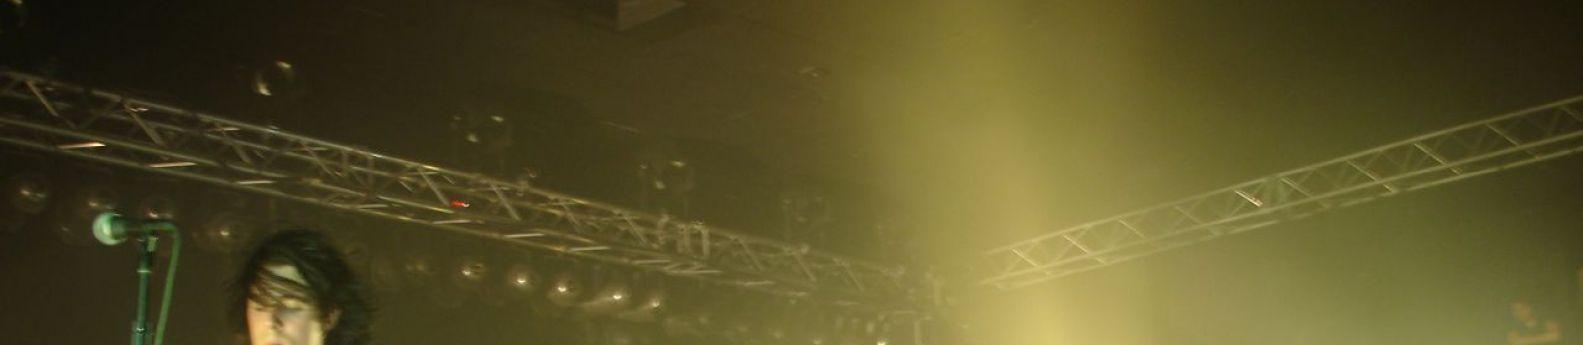 Nine Inch Nails Tickets | Ticketst.com